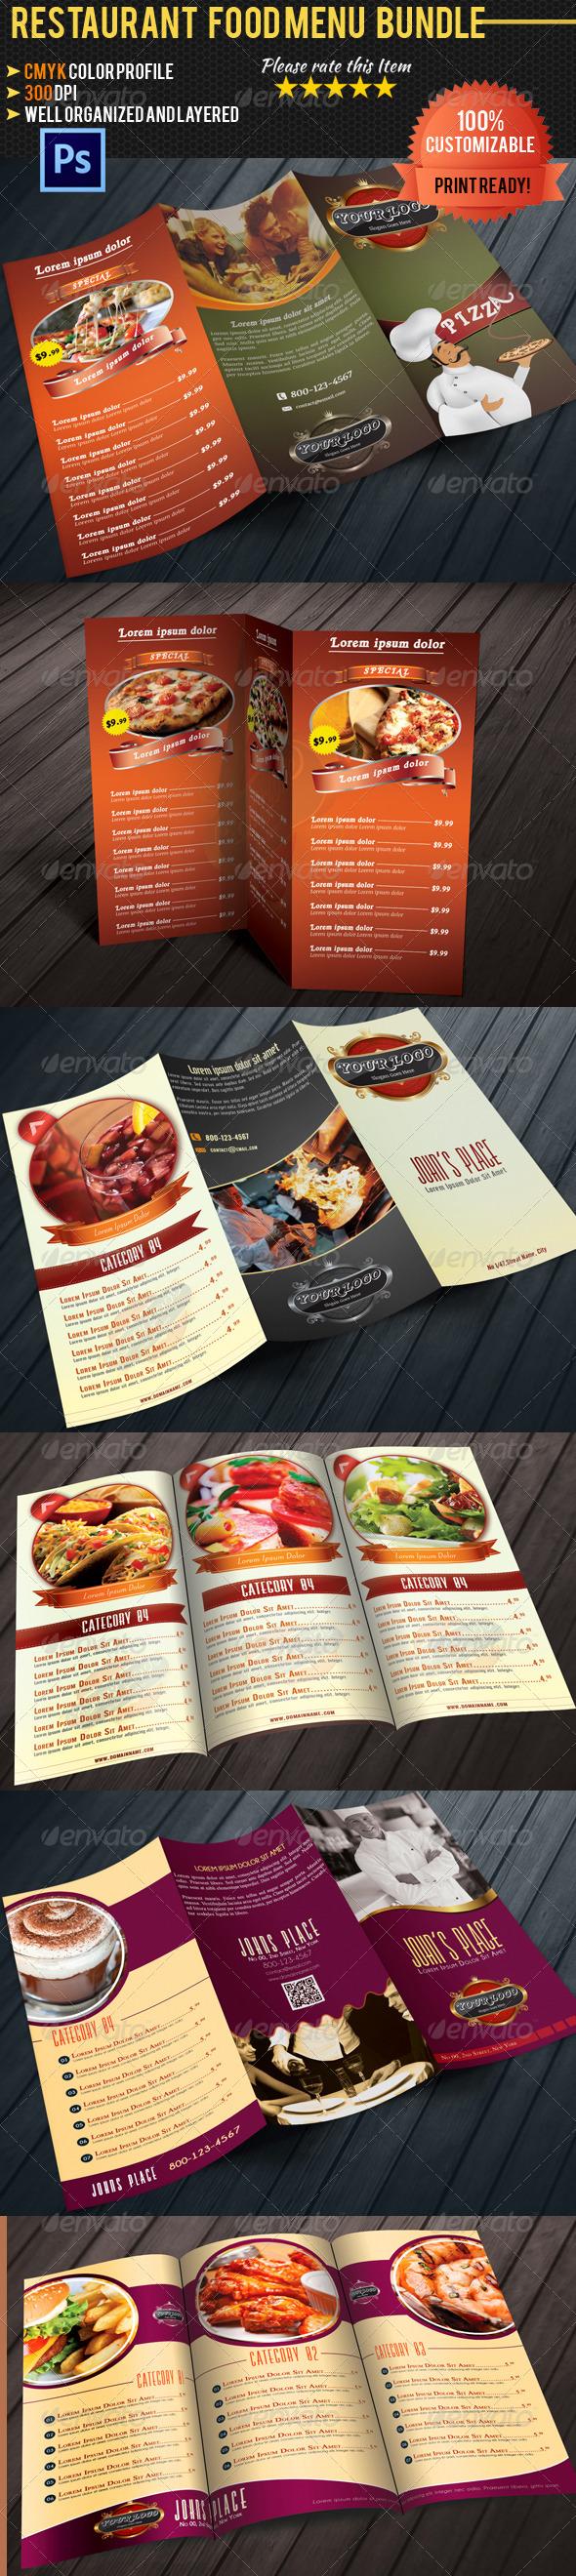 Tri-fold Restaurant Food Menu Template Bundle - Food Menus Print Templates